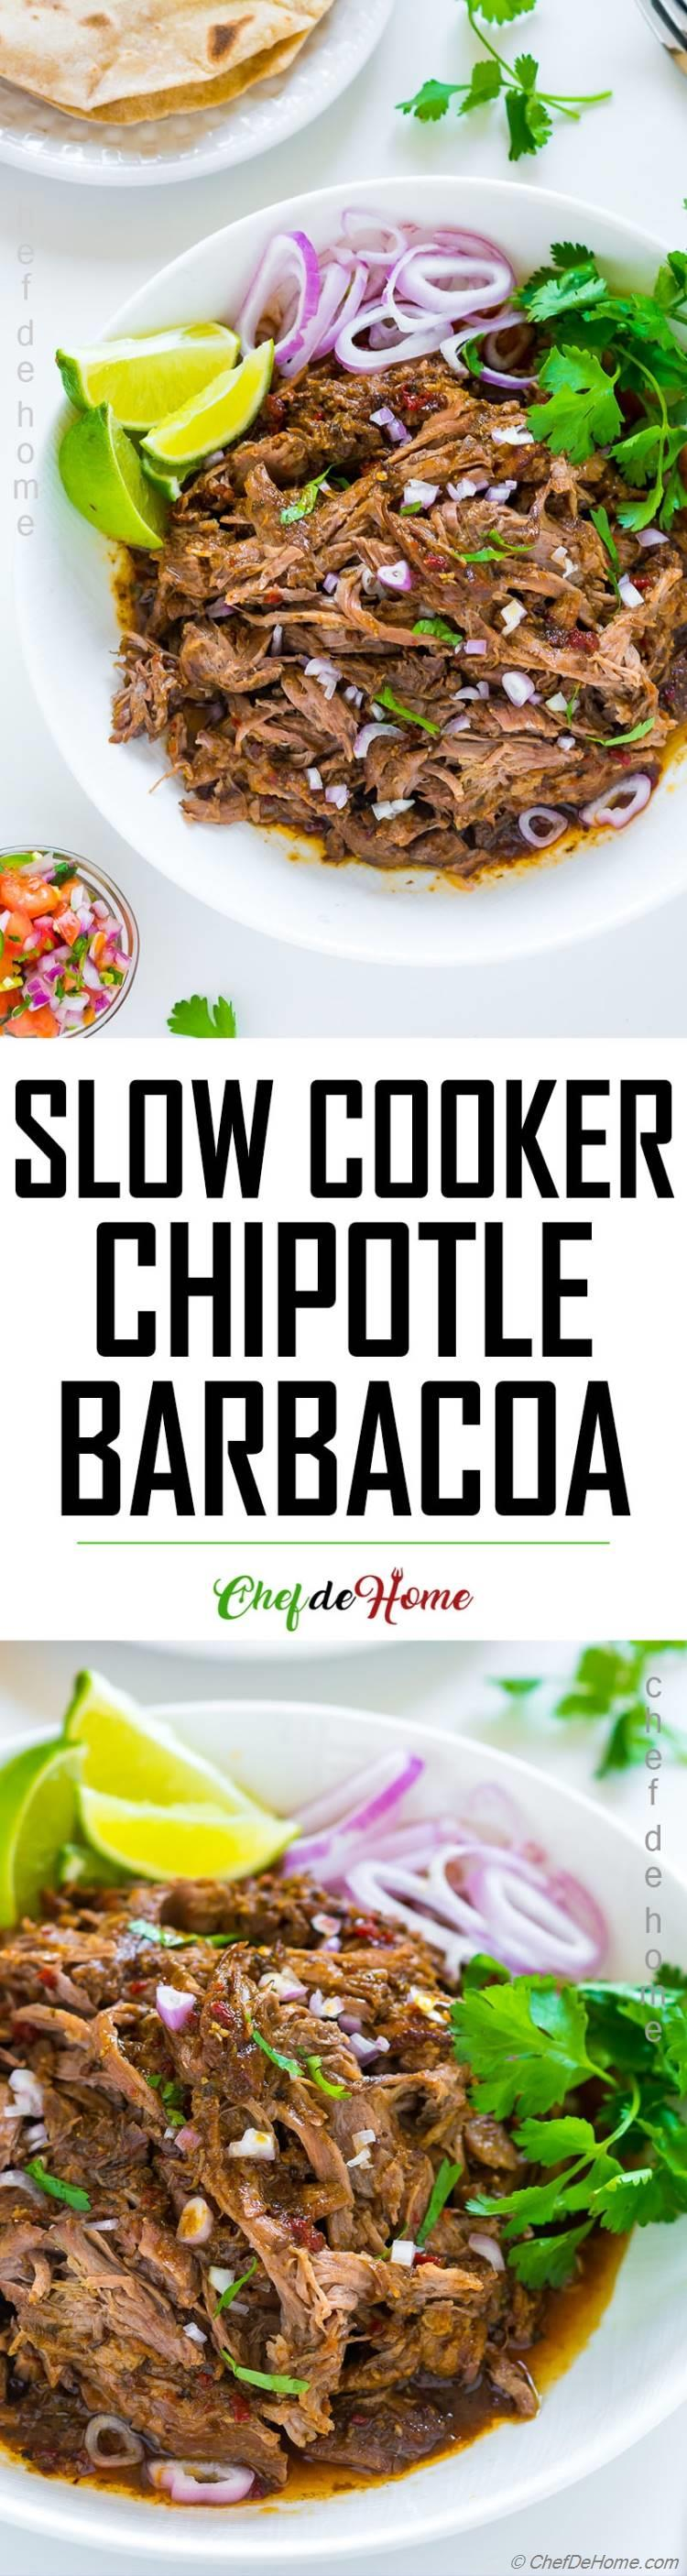 Slow Cooker Chipotle Barbacoa Recipe